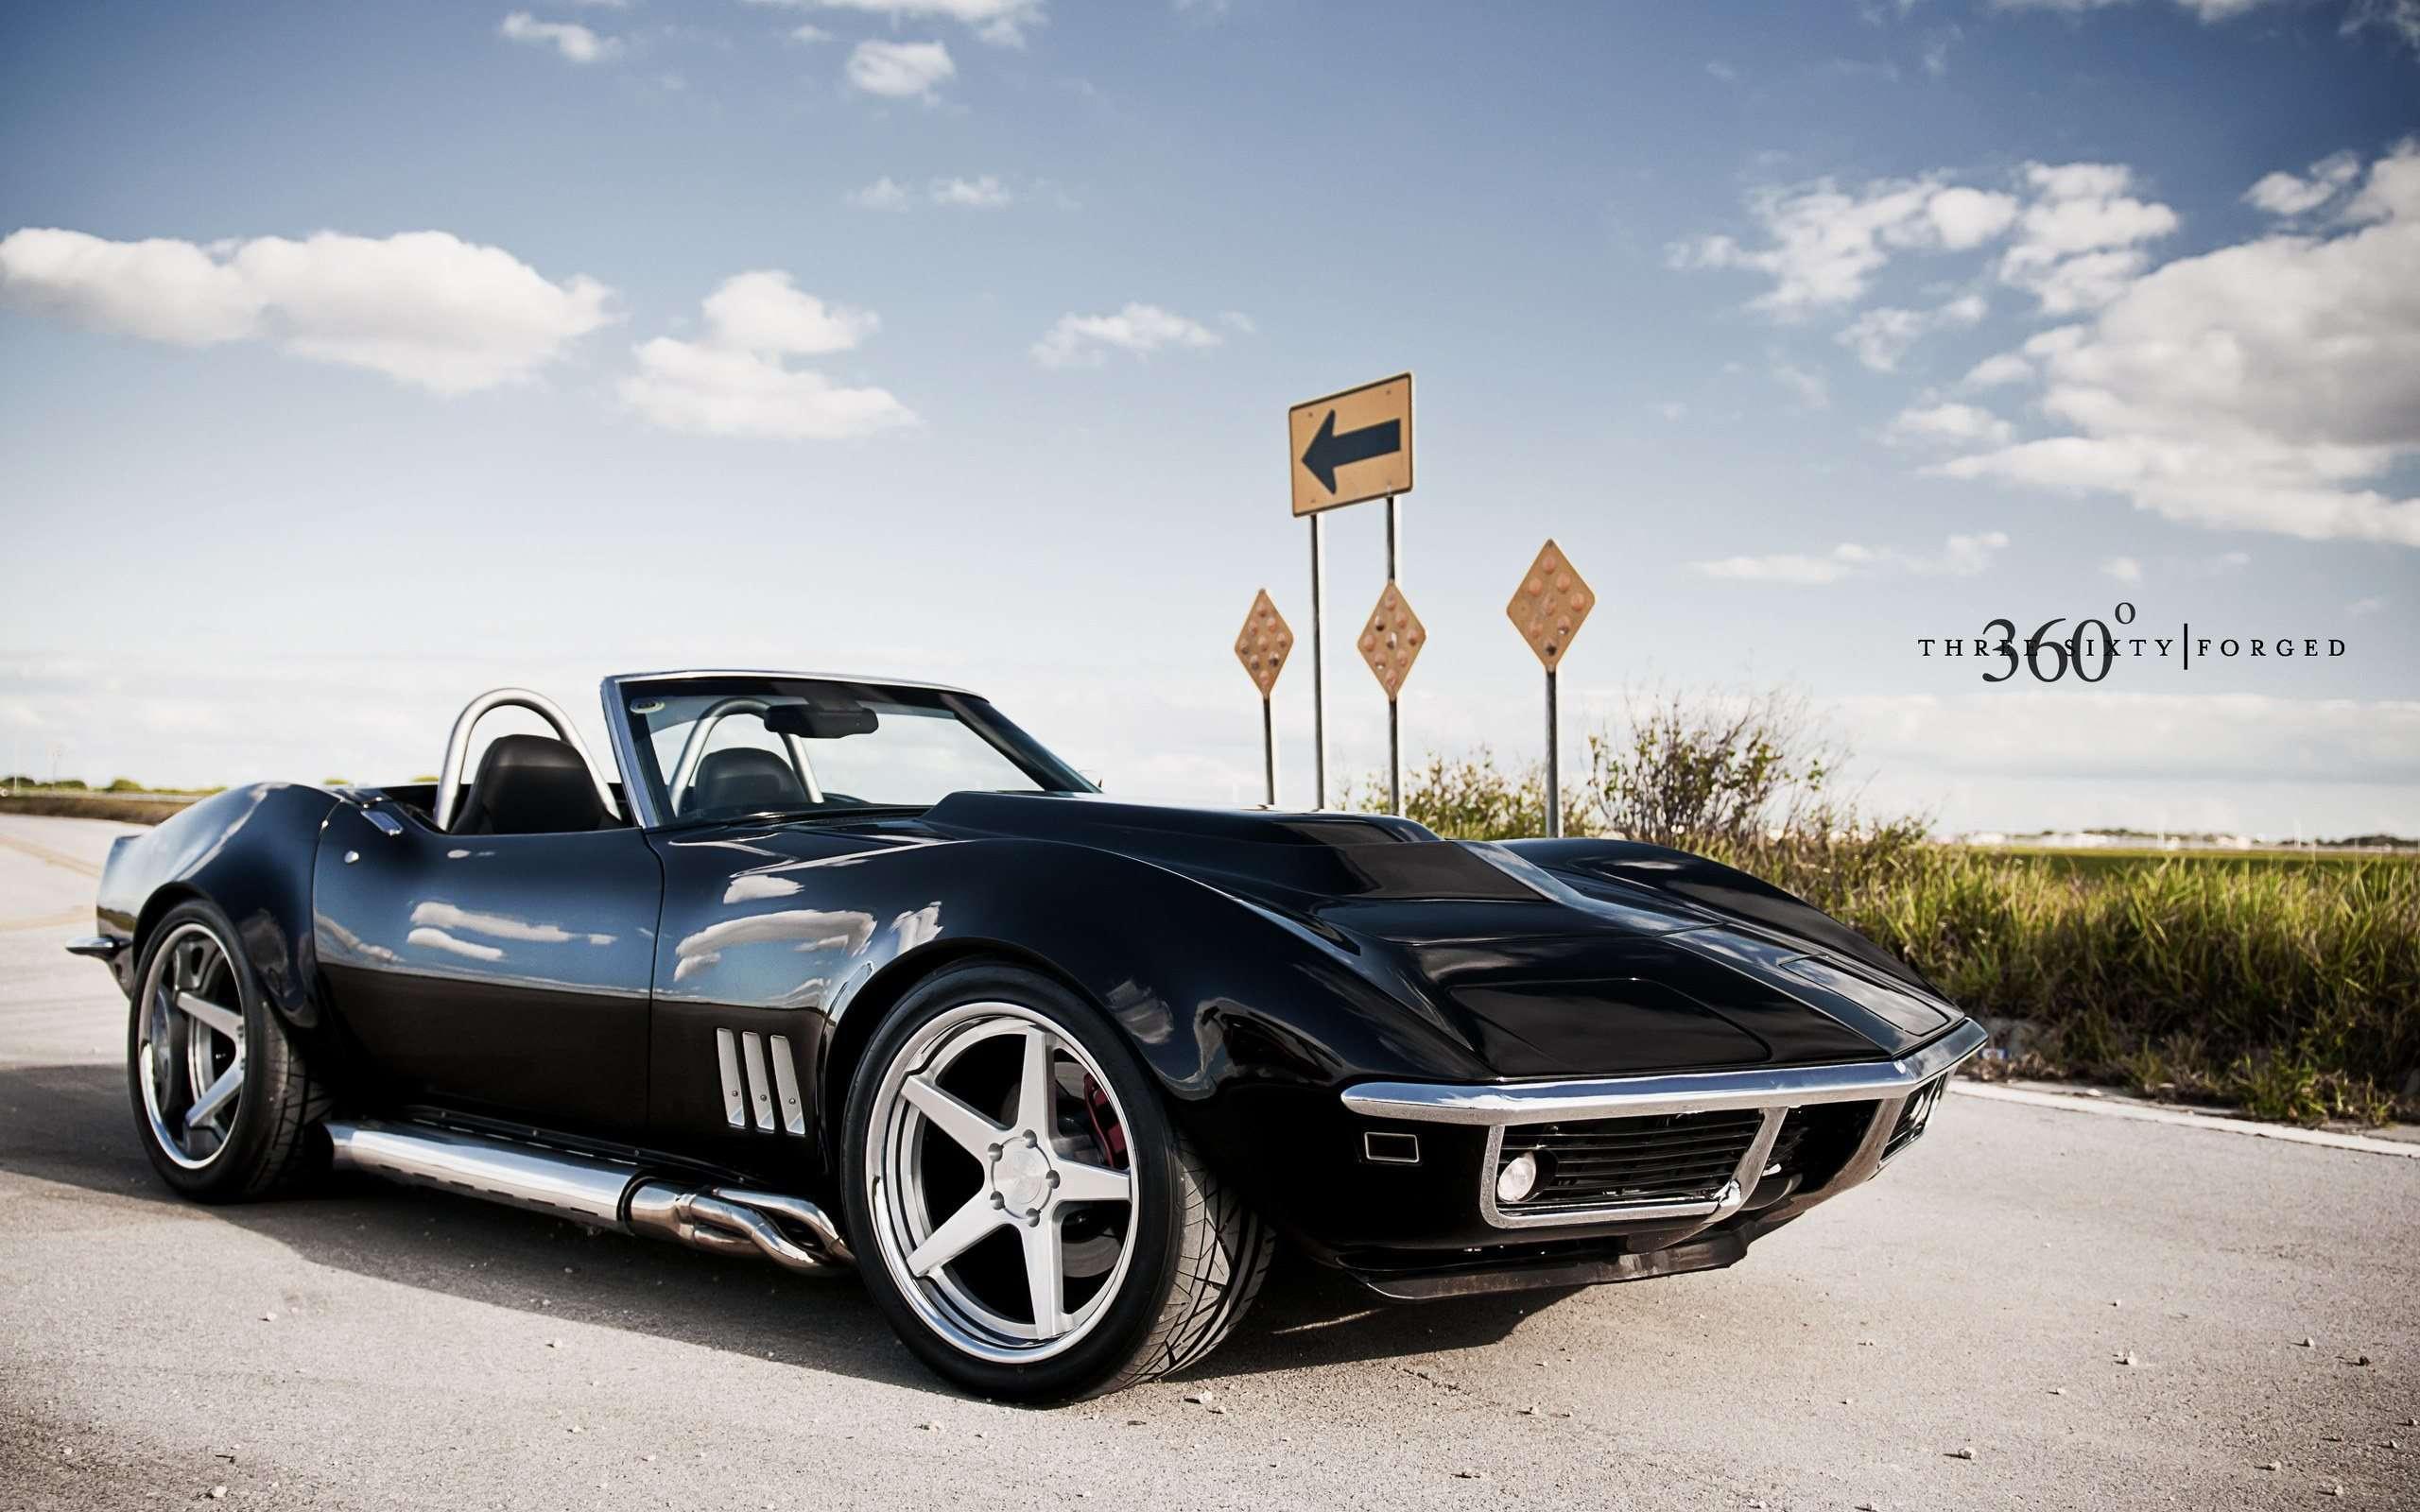 Corvette Wallpapers   Top Corvette Backgrounds   WallpaperAccess 2560x1600